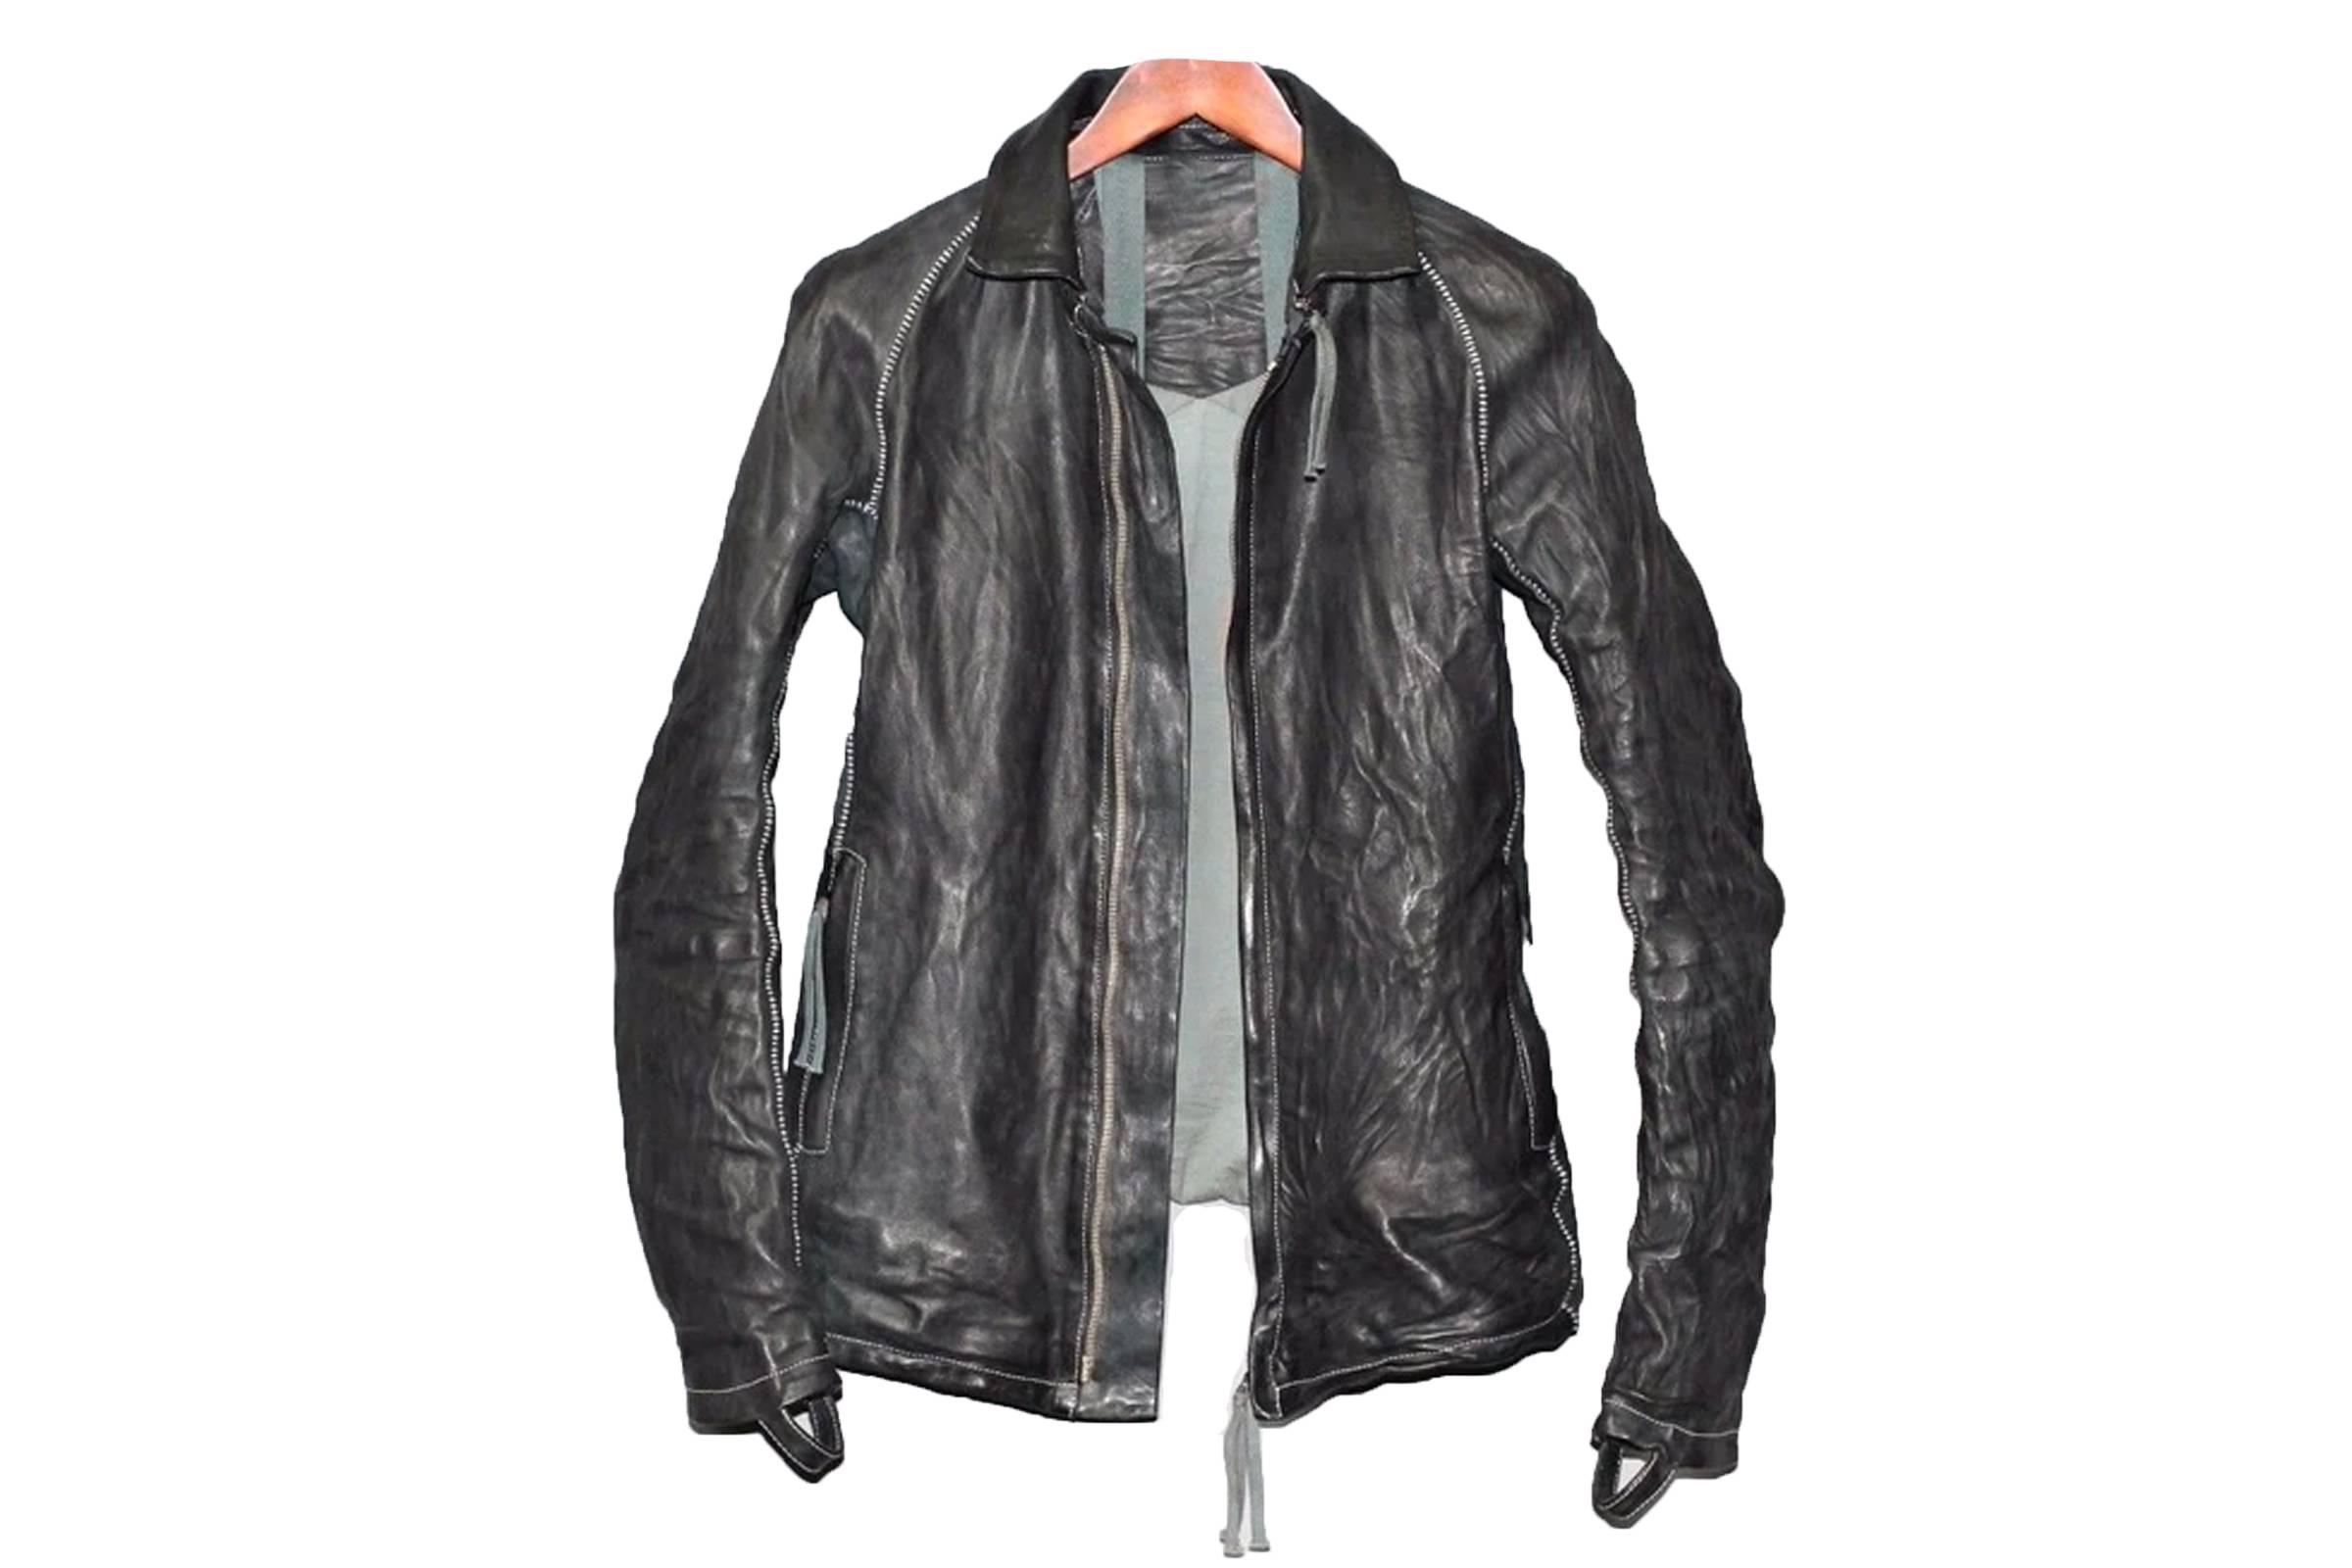 Boris Bidjan Saberi J2 Horse Leather Jacket